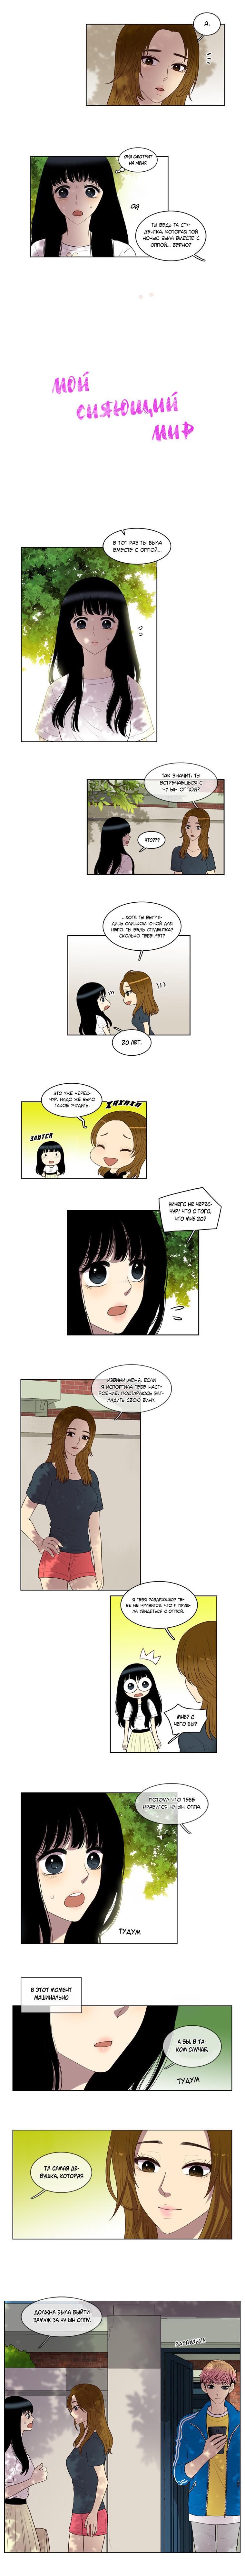 https://r1.mangarussia.com/comics/pic2/6/22022/224244/1428909081614.jpg Page 1